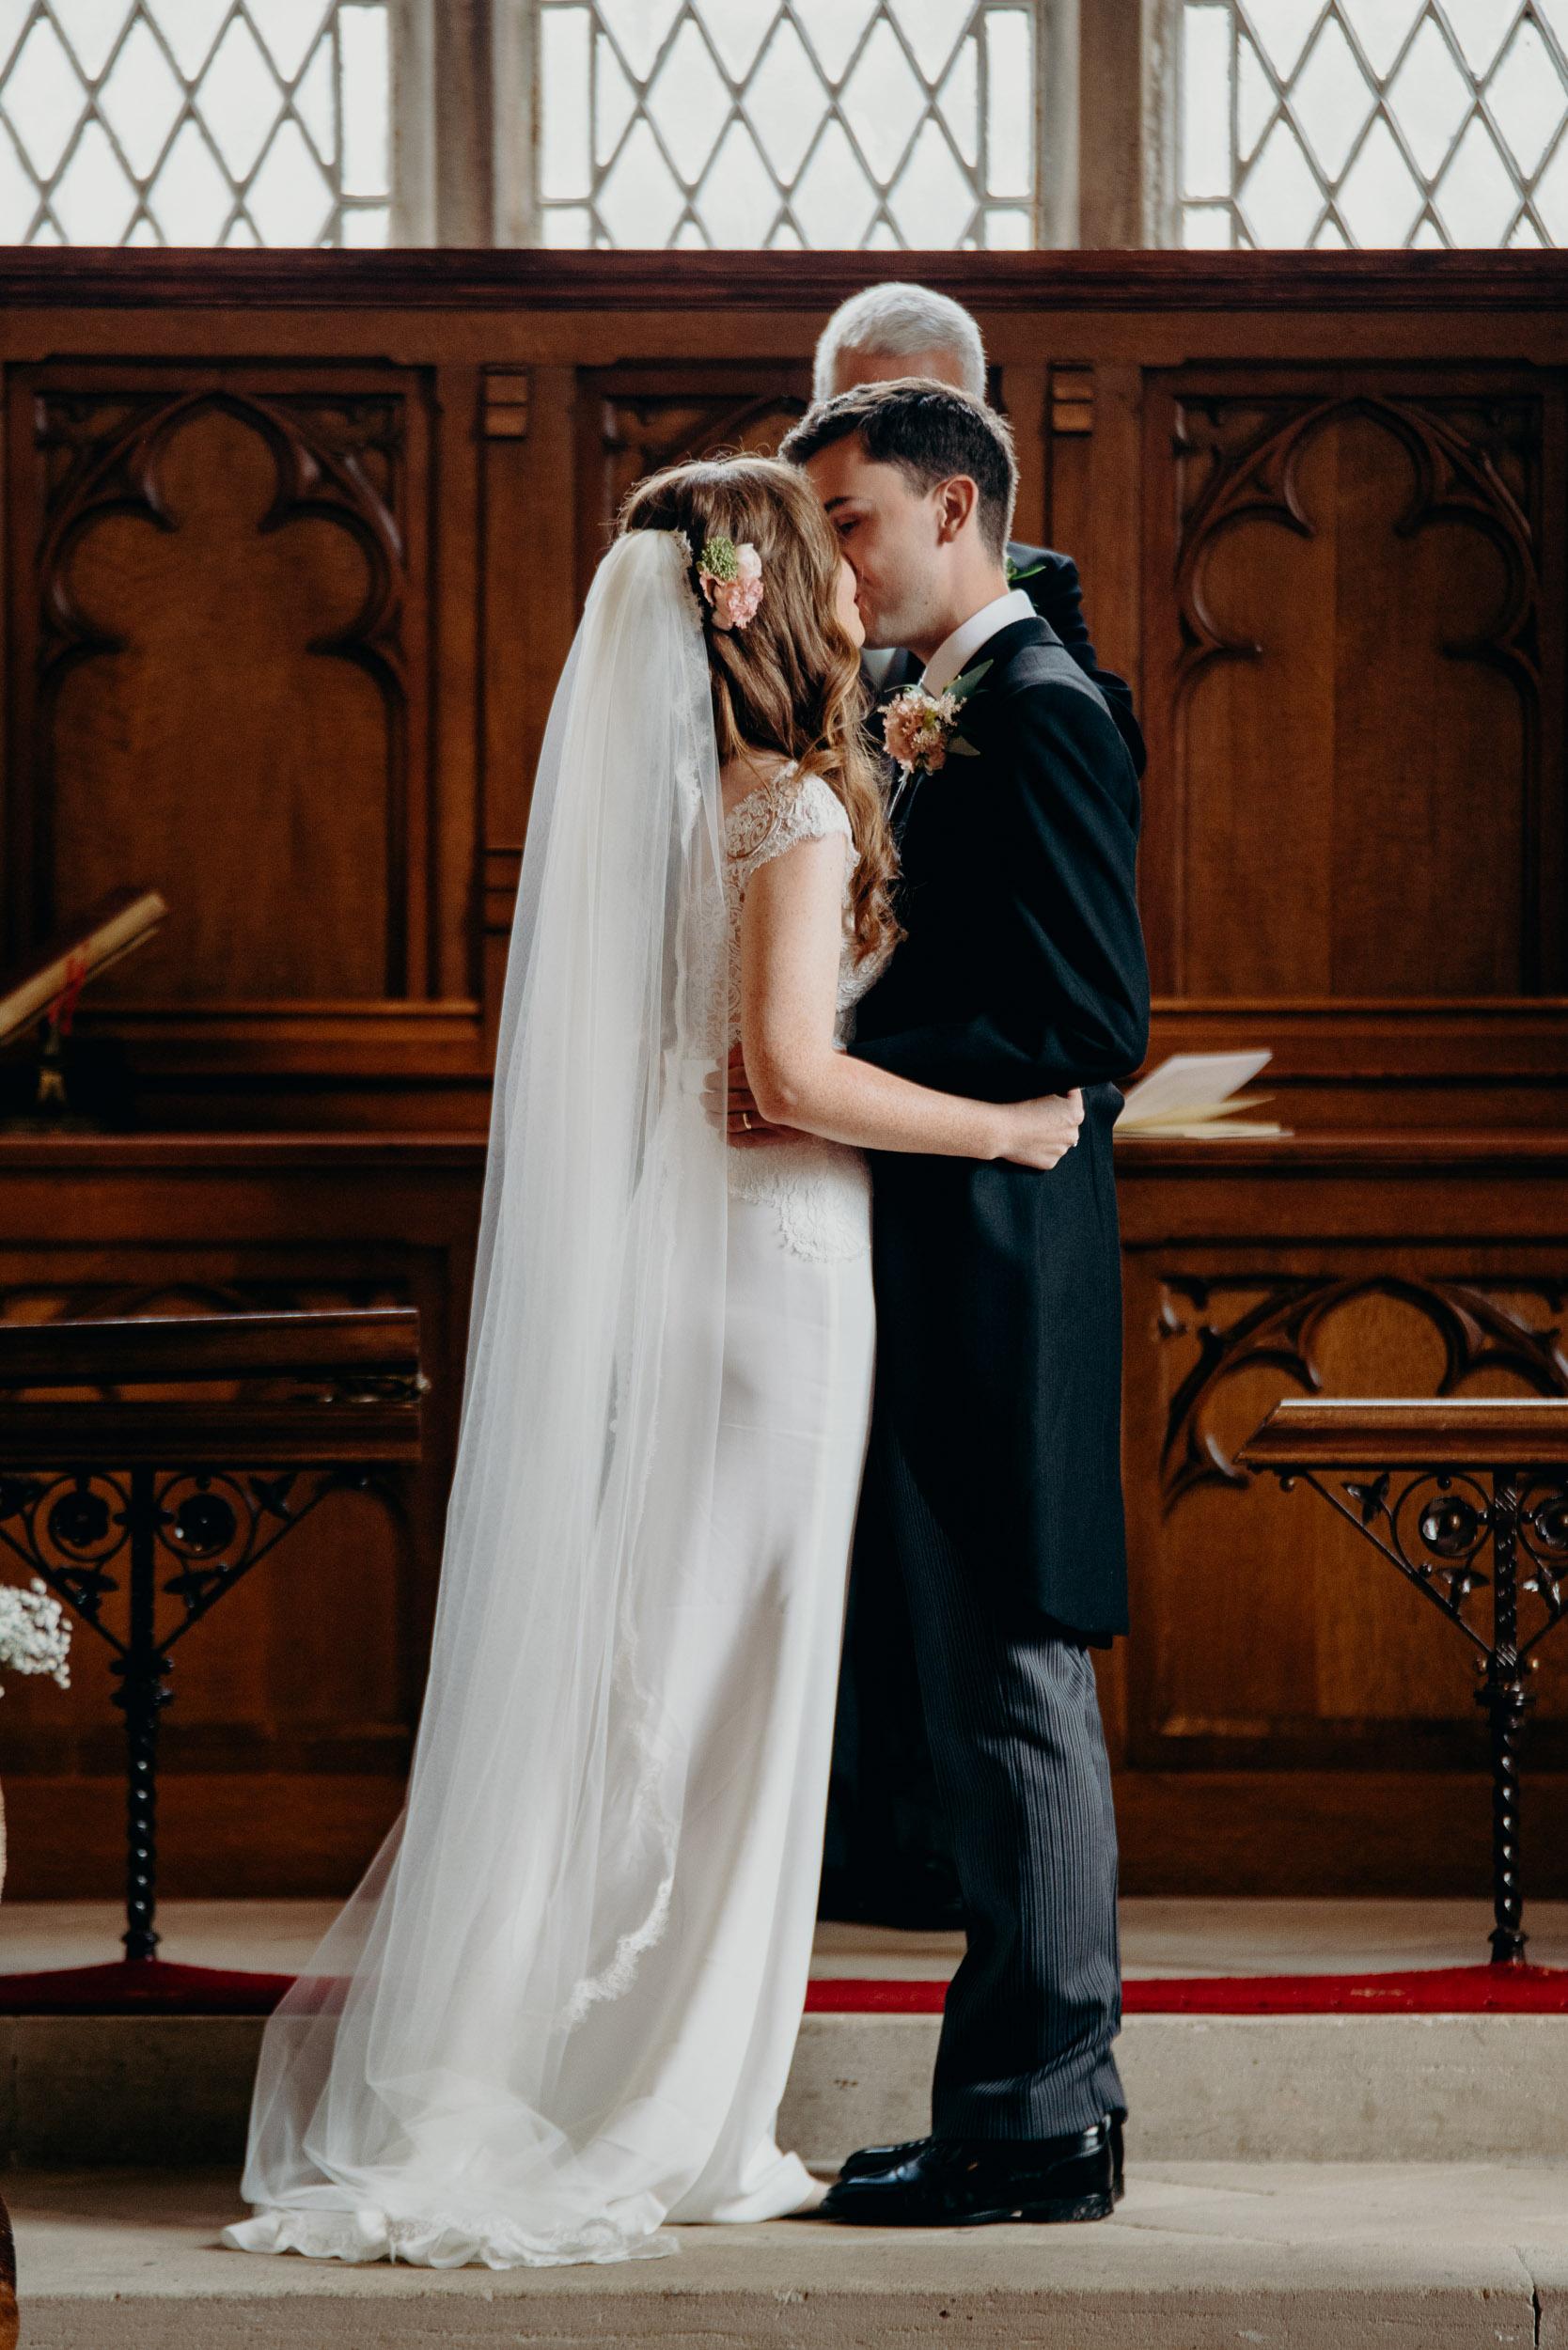 drenagh estate wedding photography-53.jpg